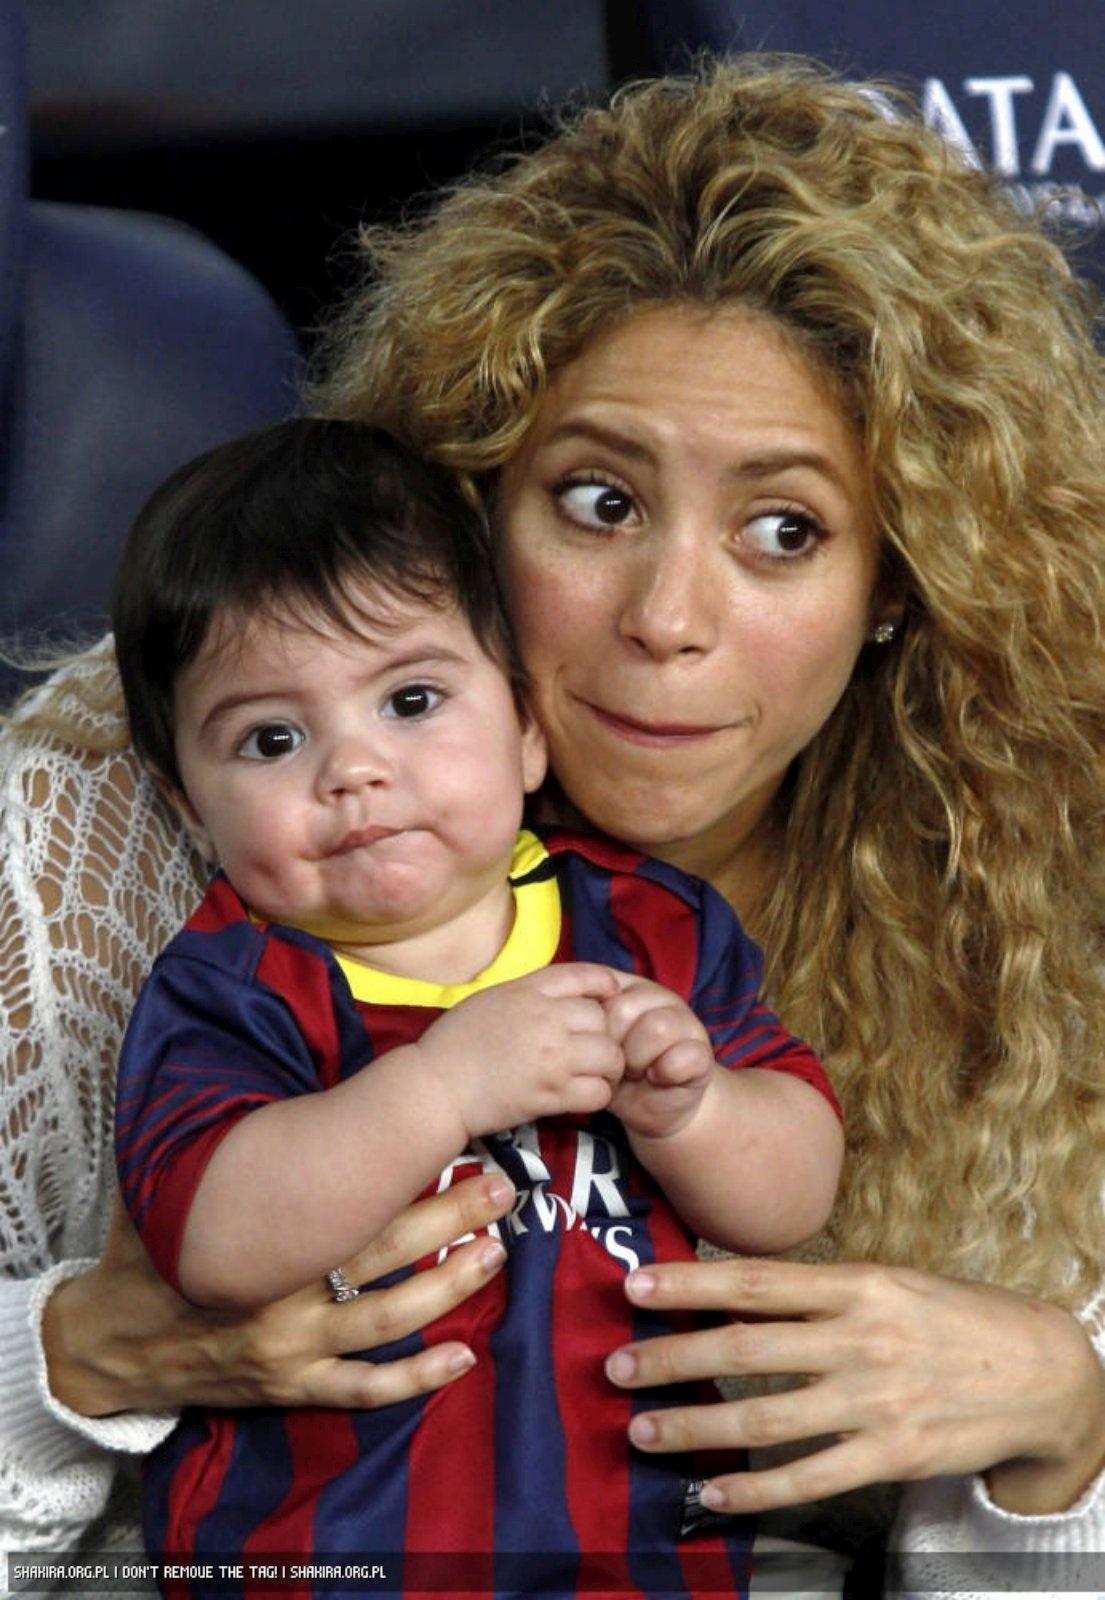 Exclusif - Shakira, son mari Gerard Piqu et leurs enfants, Milan et Photo de shakira et son mari